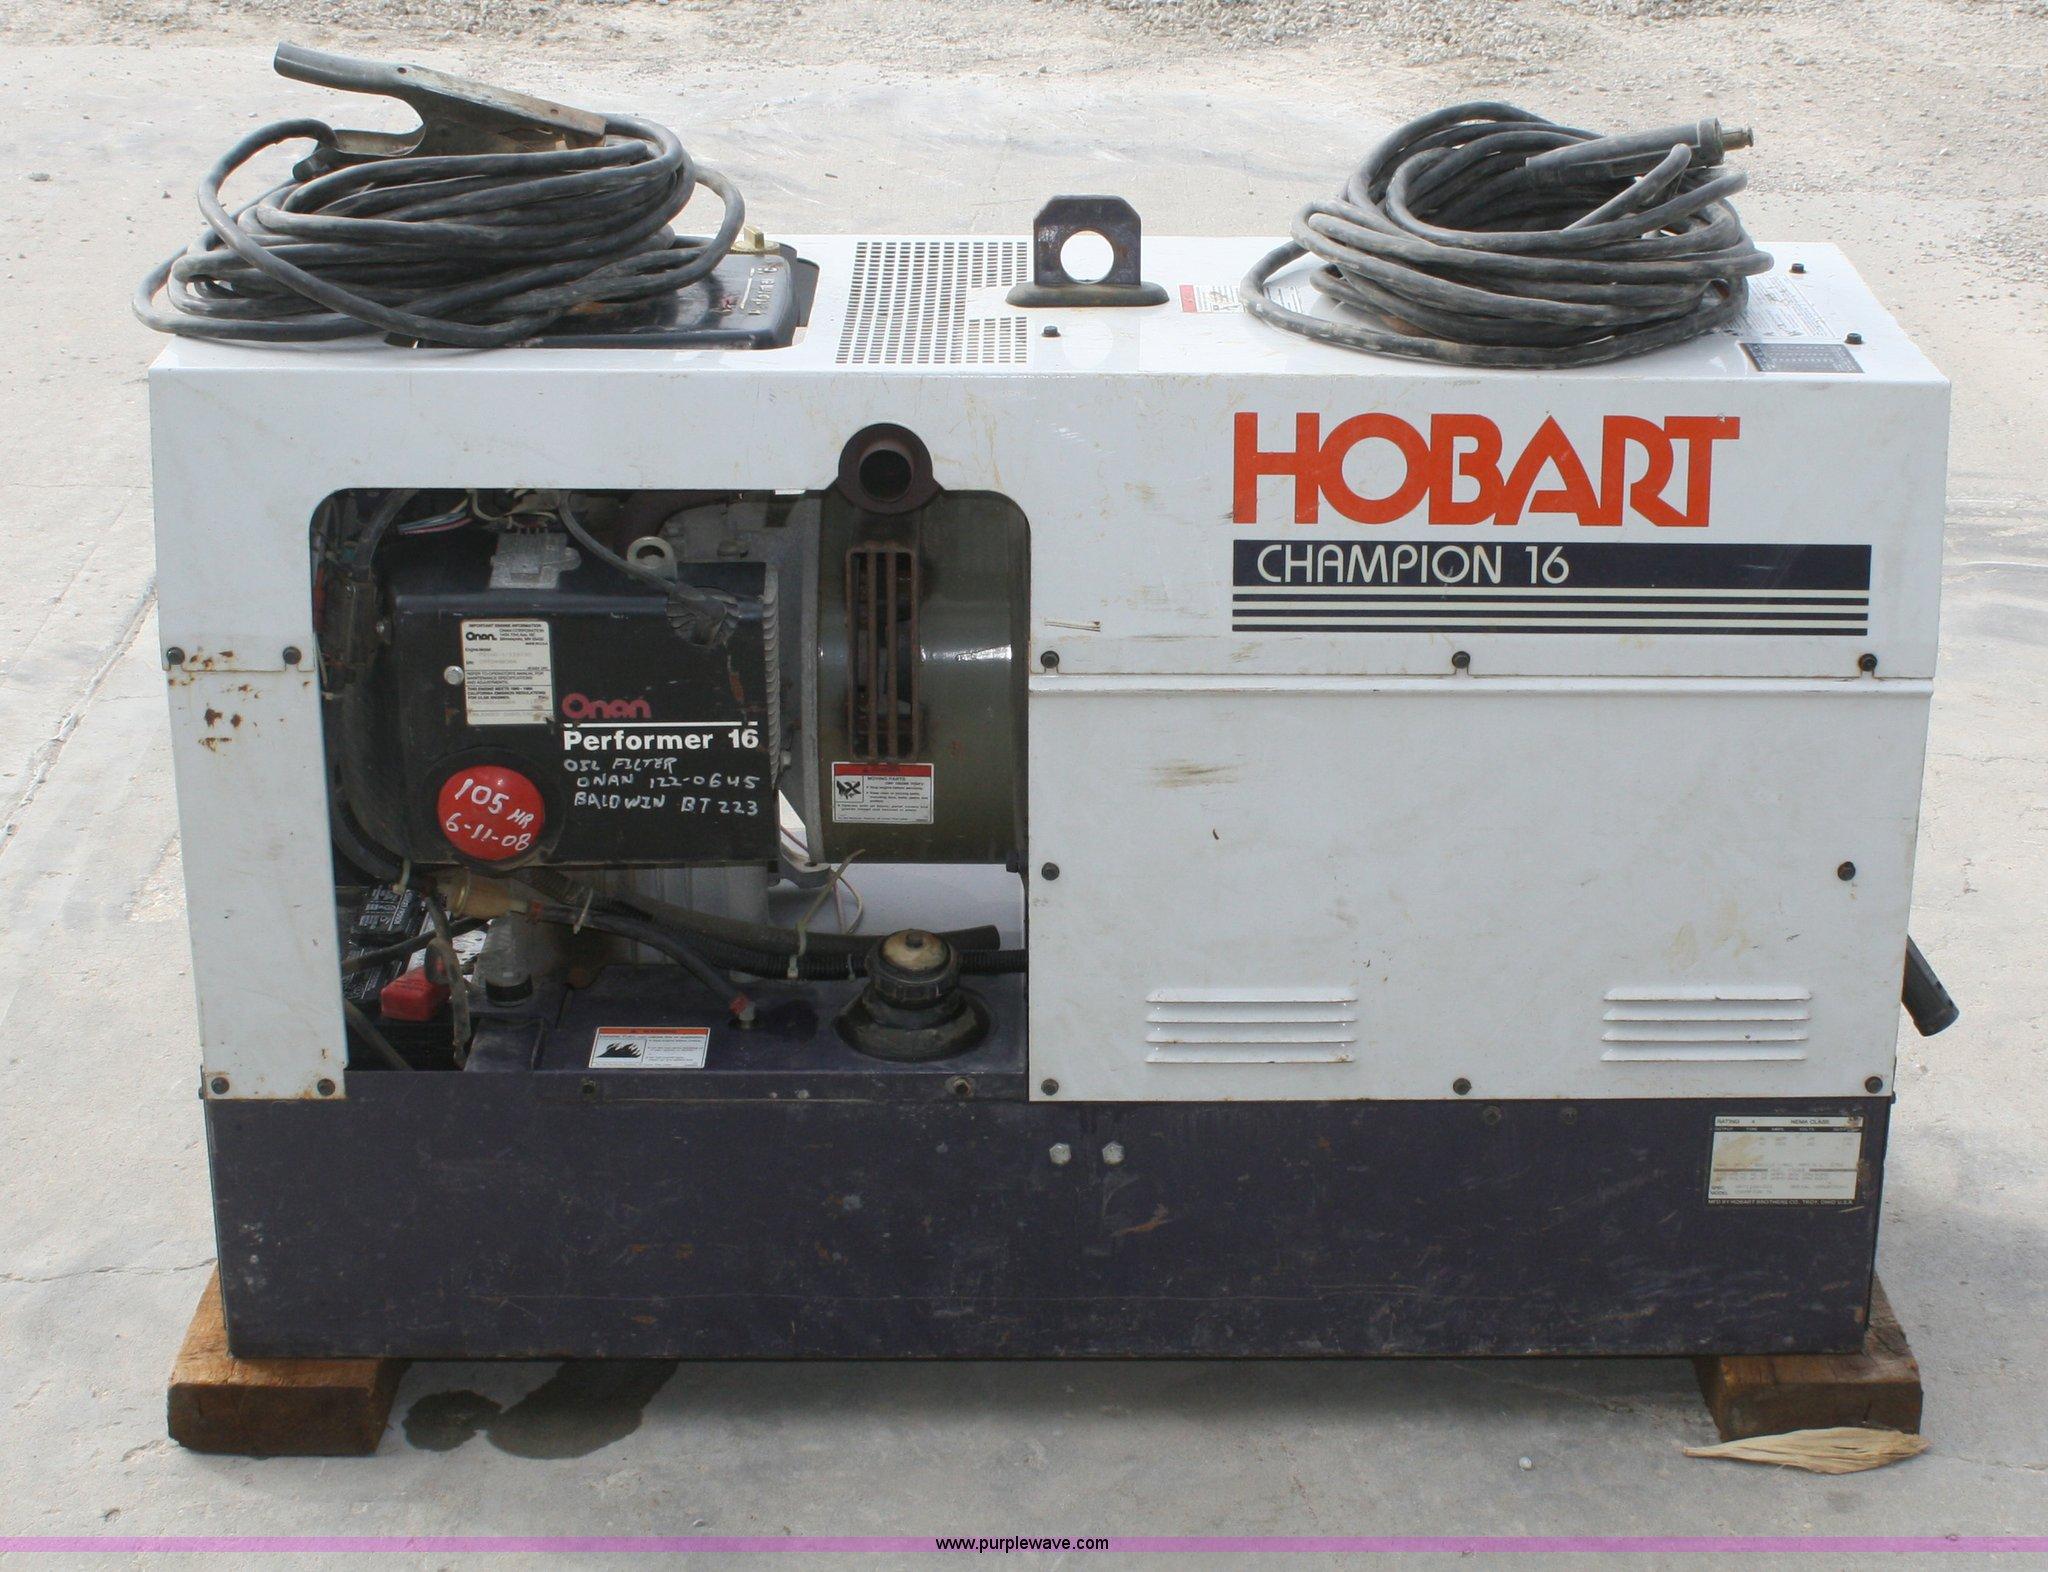 Lincoln G8000 Welder Wiring Diagram Free For You Weldanpower 225 Mig Torch Parts